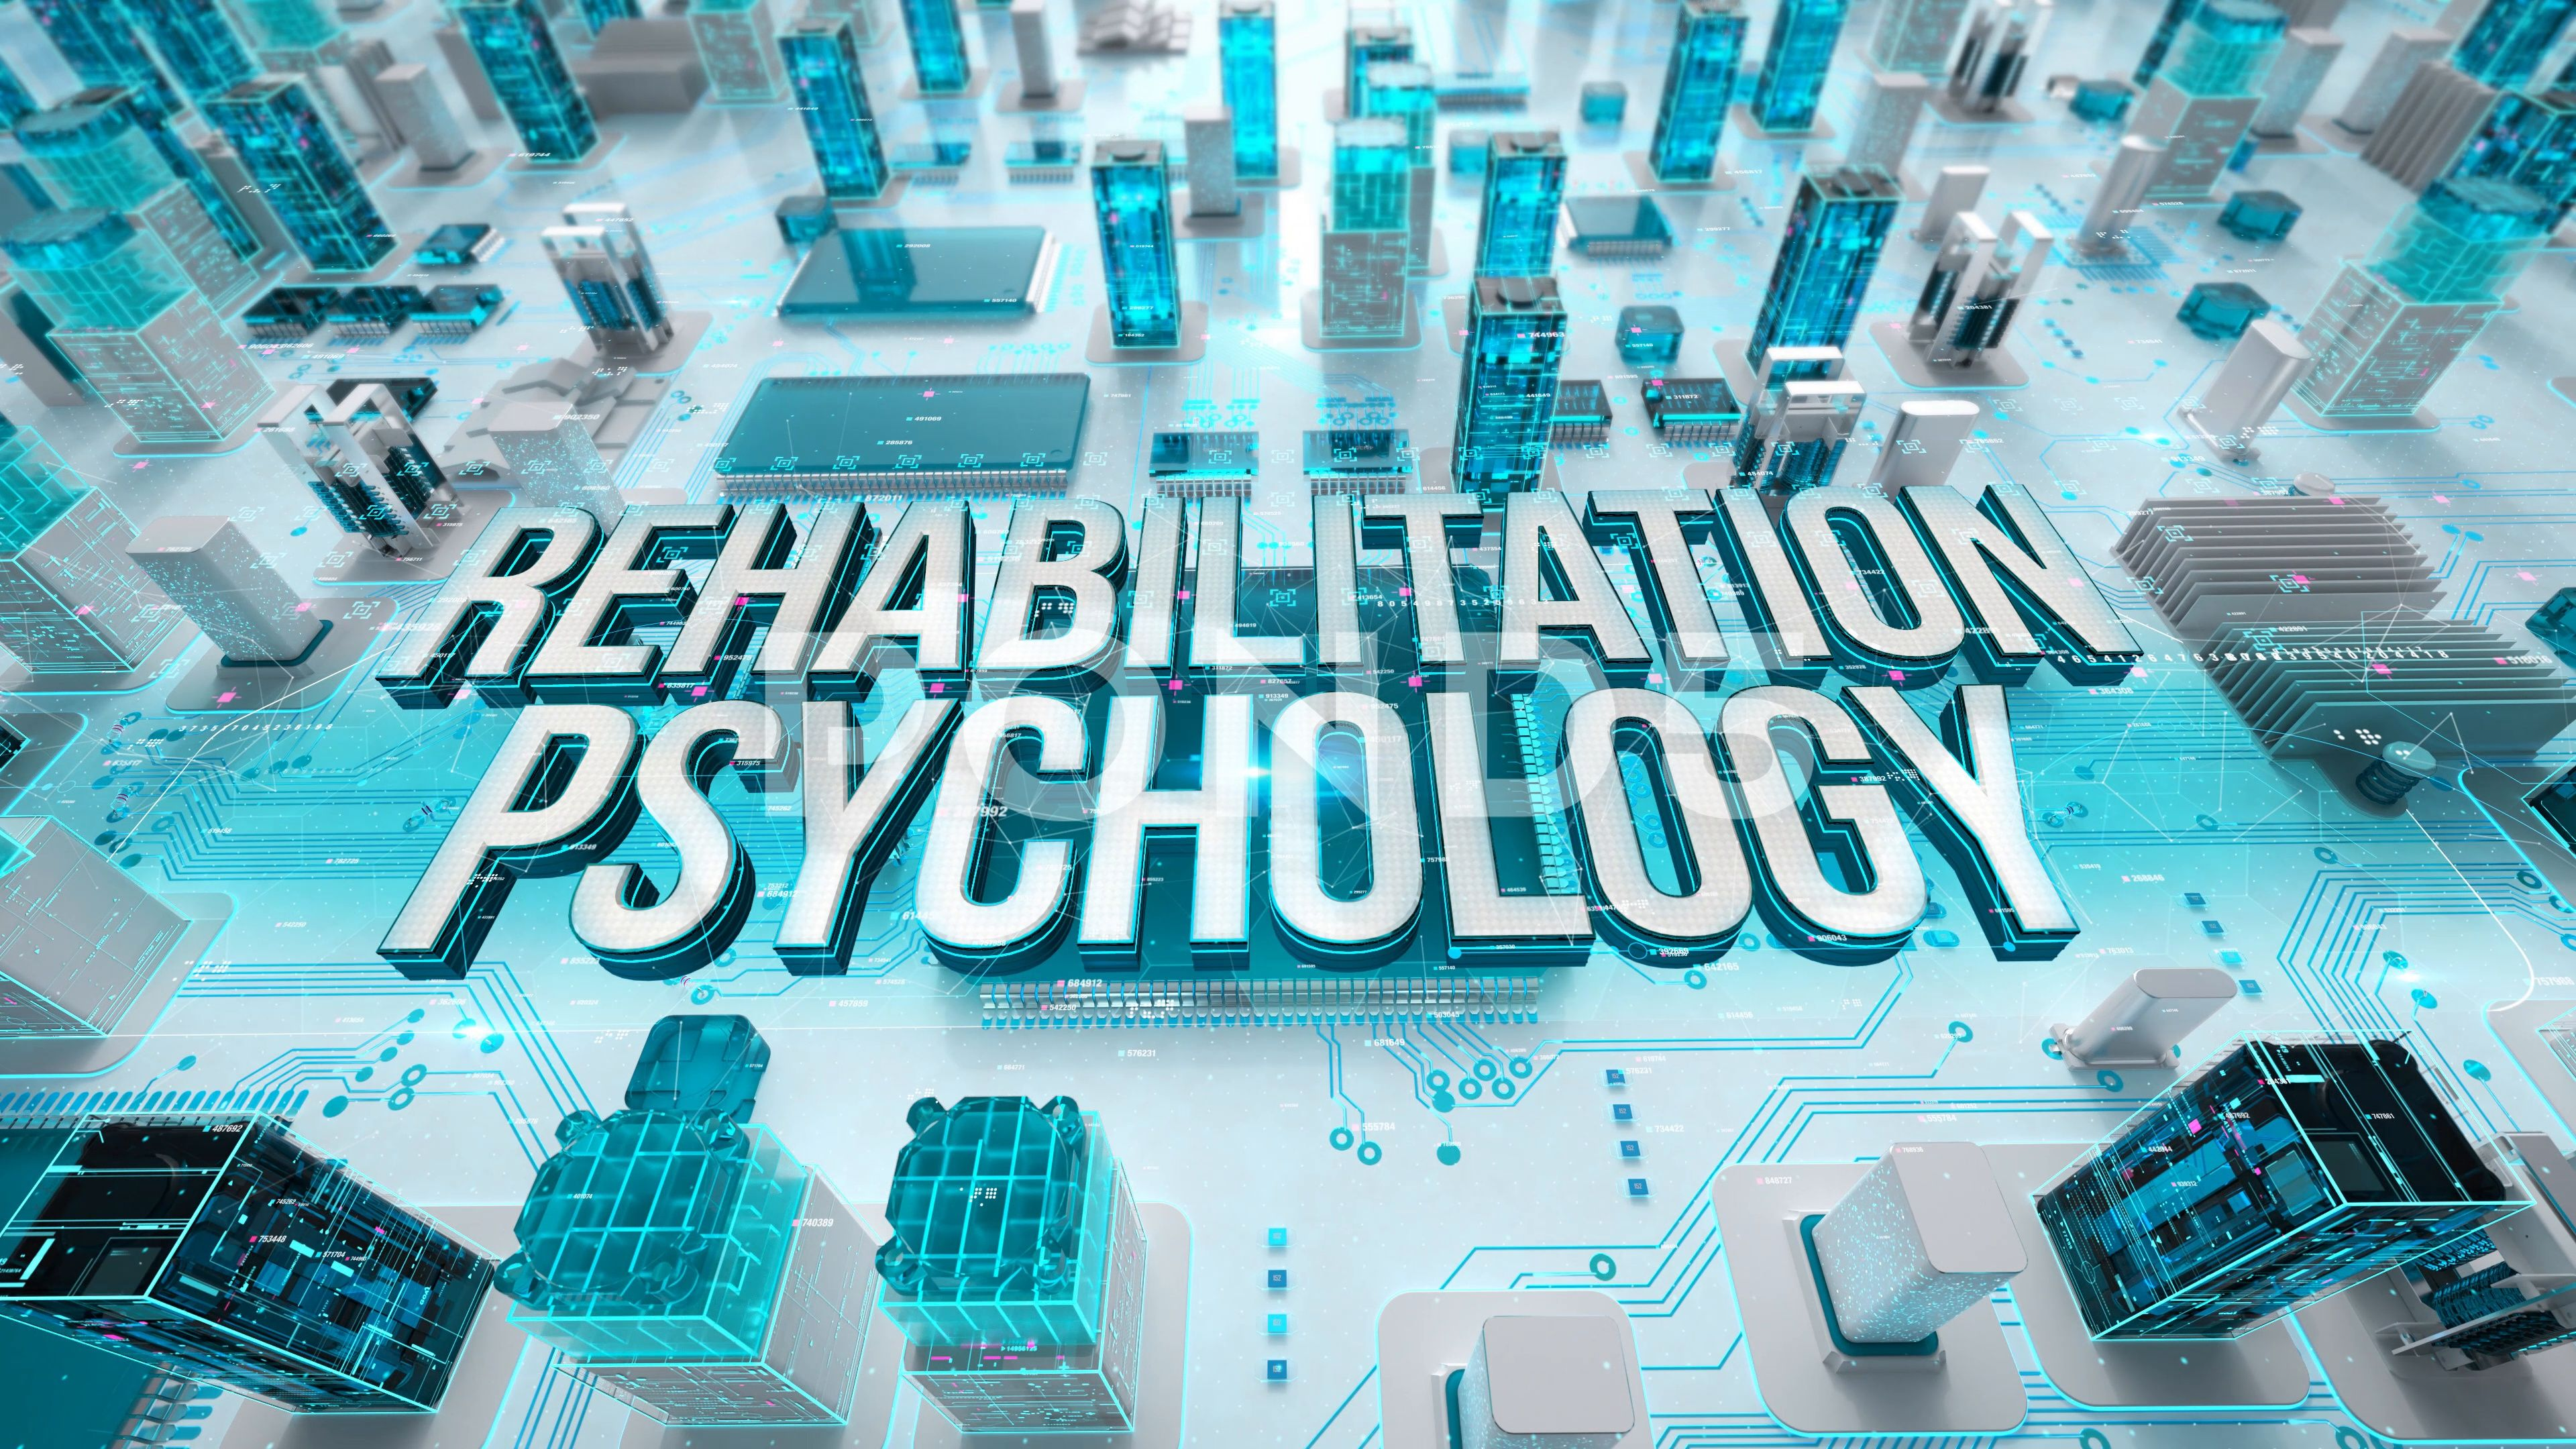 Rehabilitation Psychology with medical digital technology